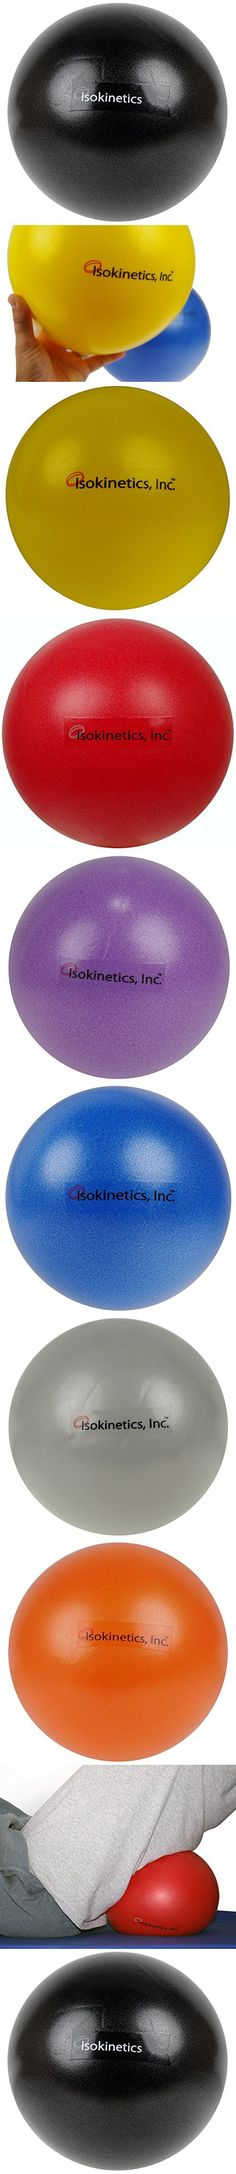 "Isokinetics Inc. Brand Mini Exercise Ball - 25cm (7"" to 9"") - Black"